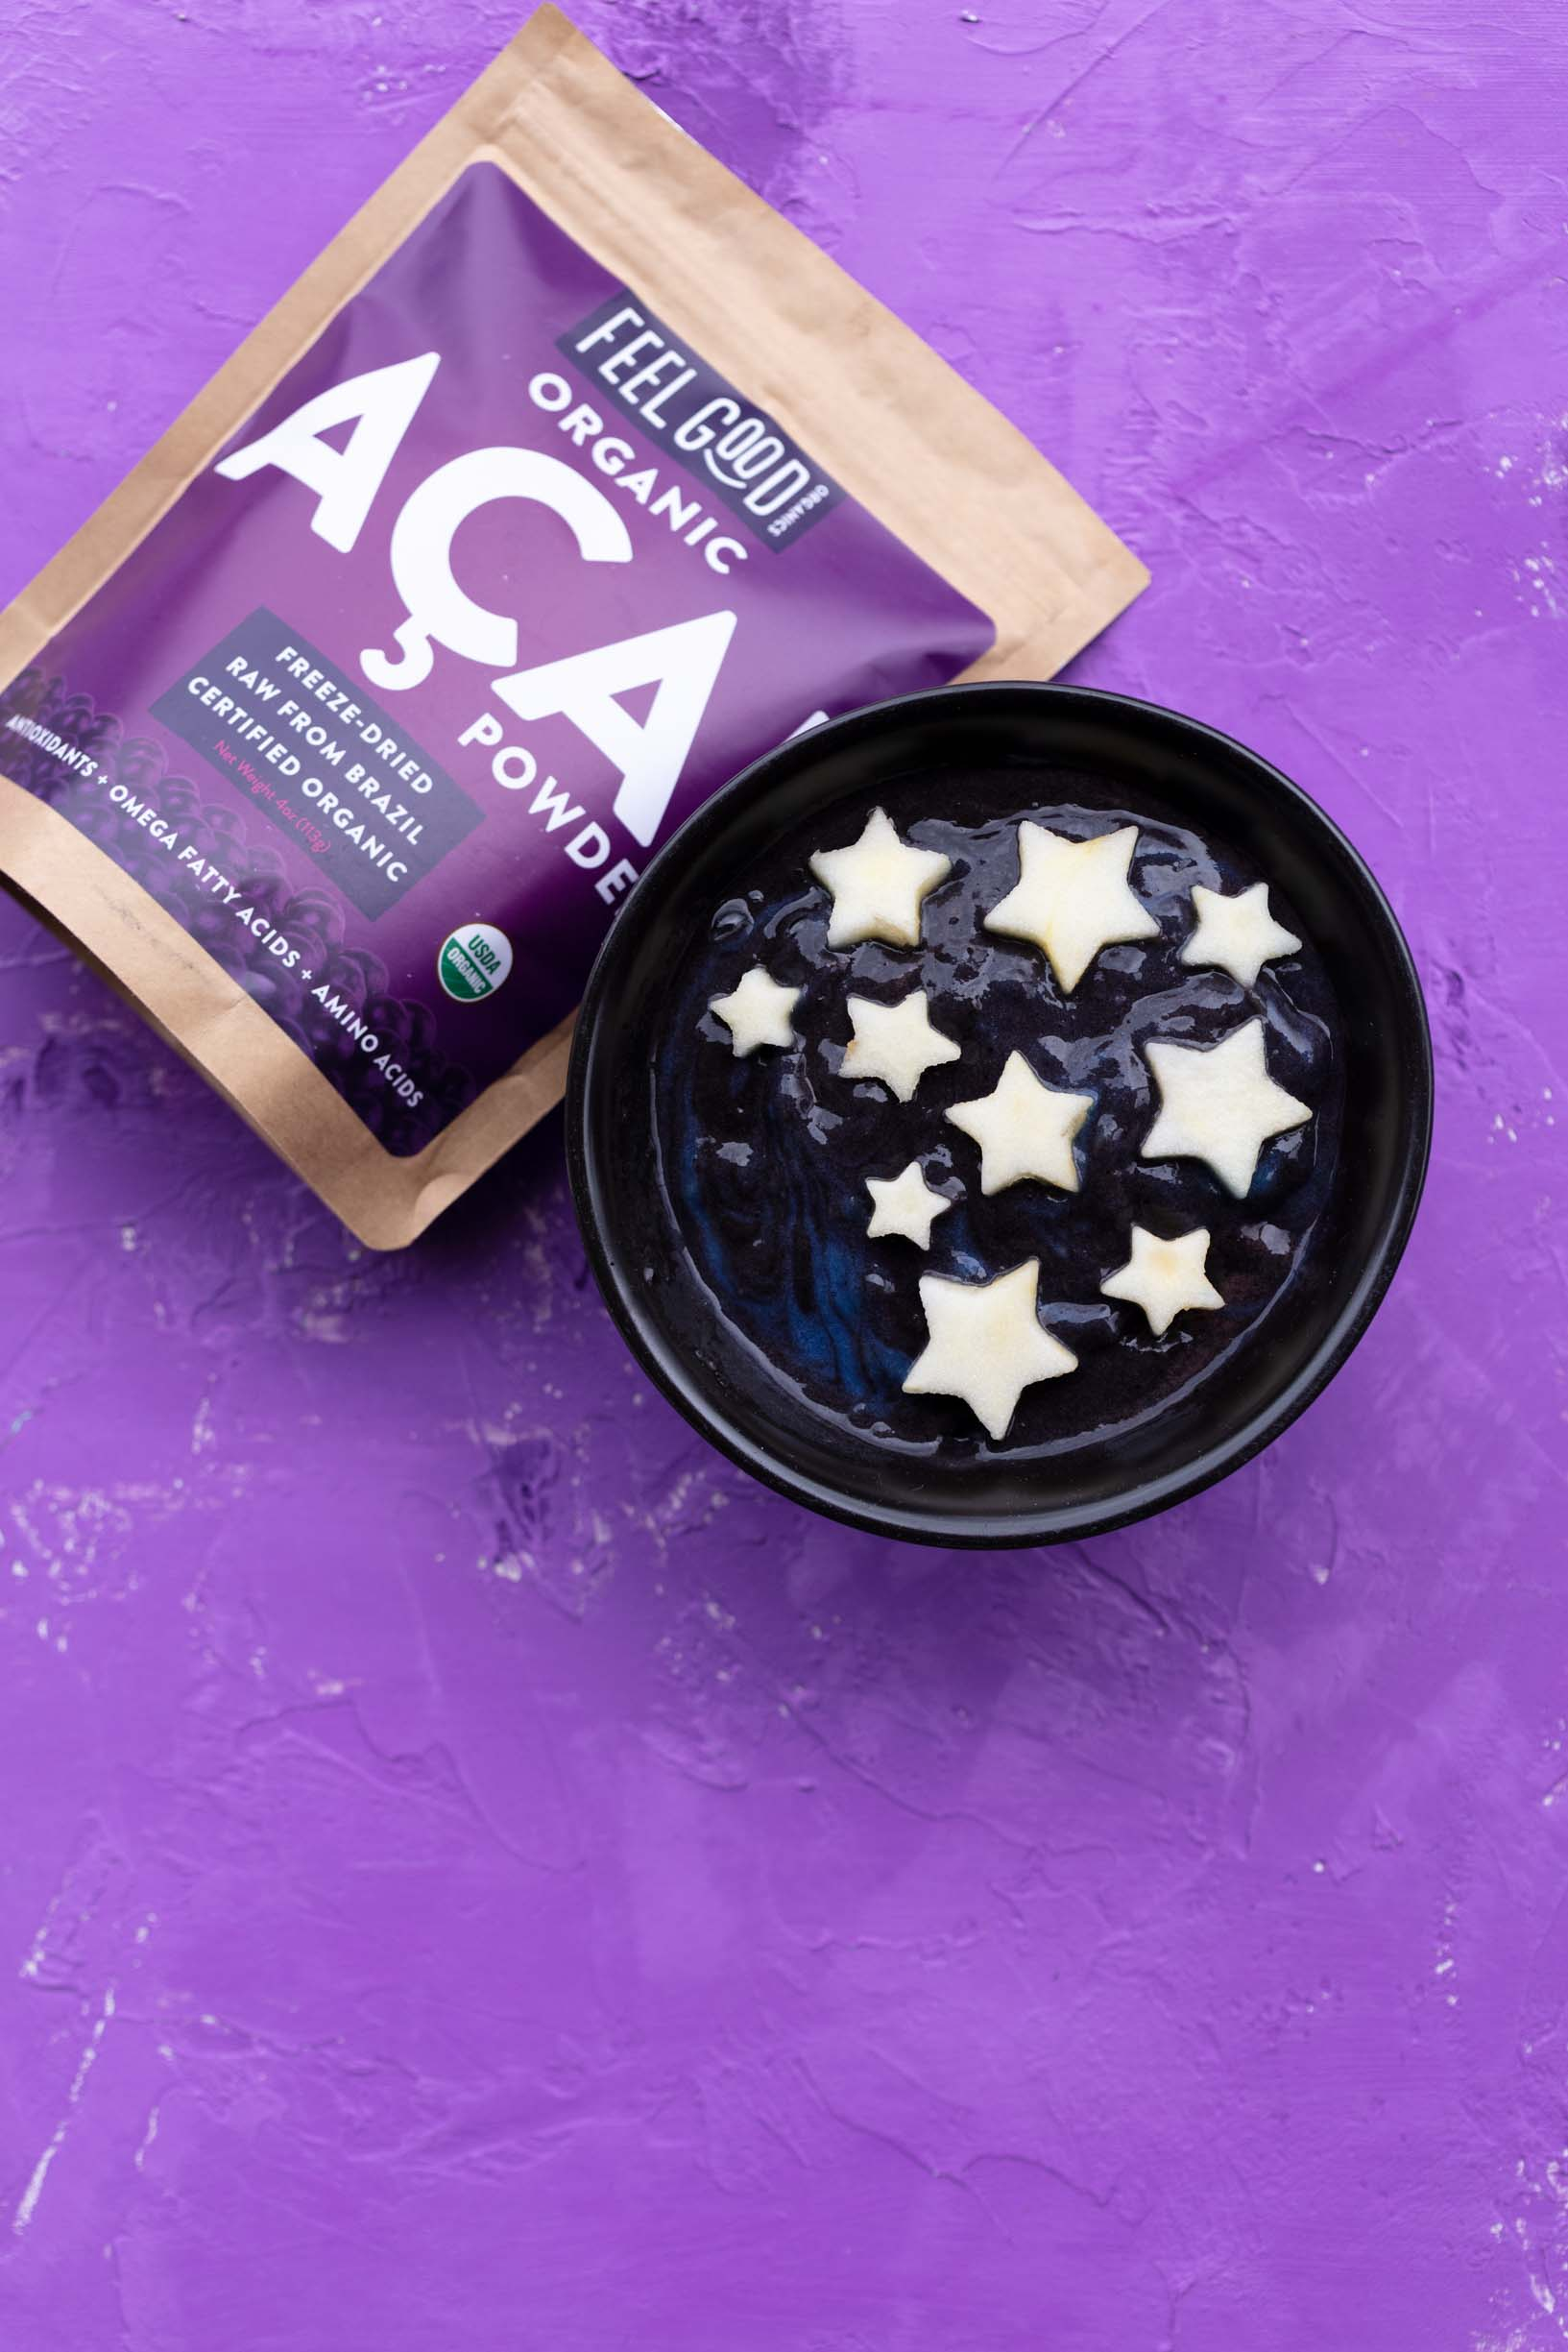 Feel Good Organics acai berry powder next to a galaxy acai smoothie bowl